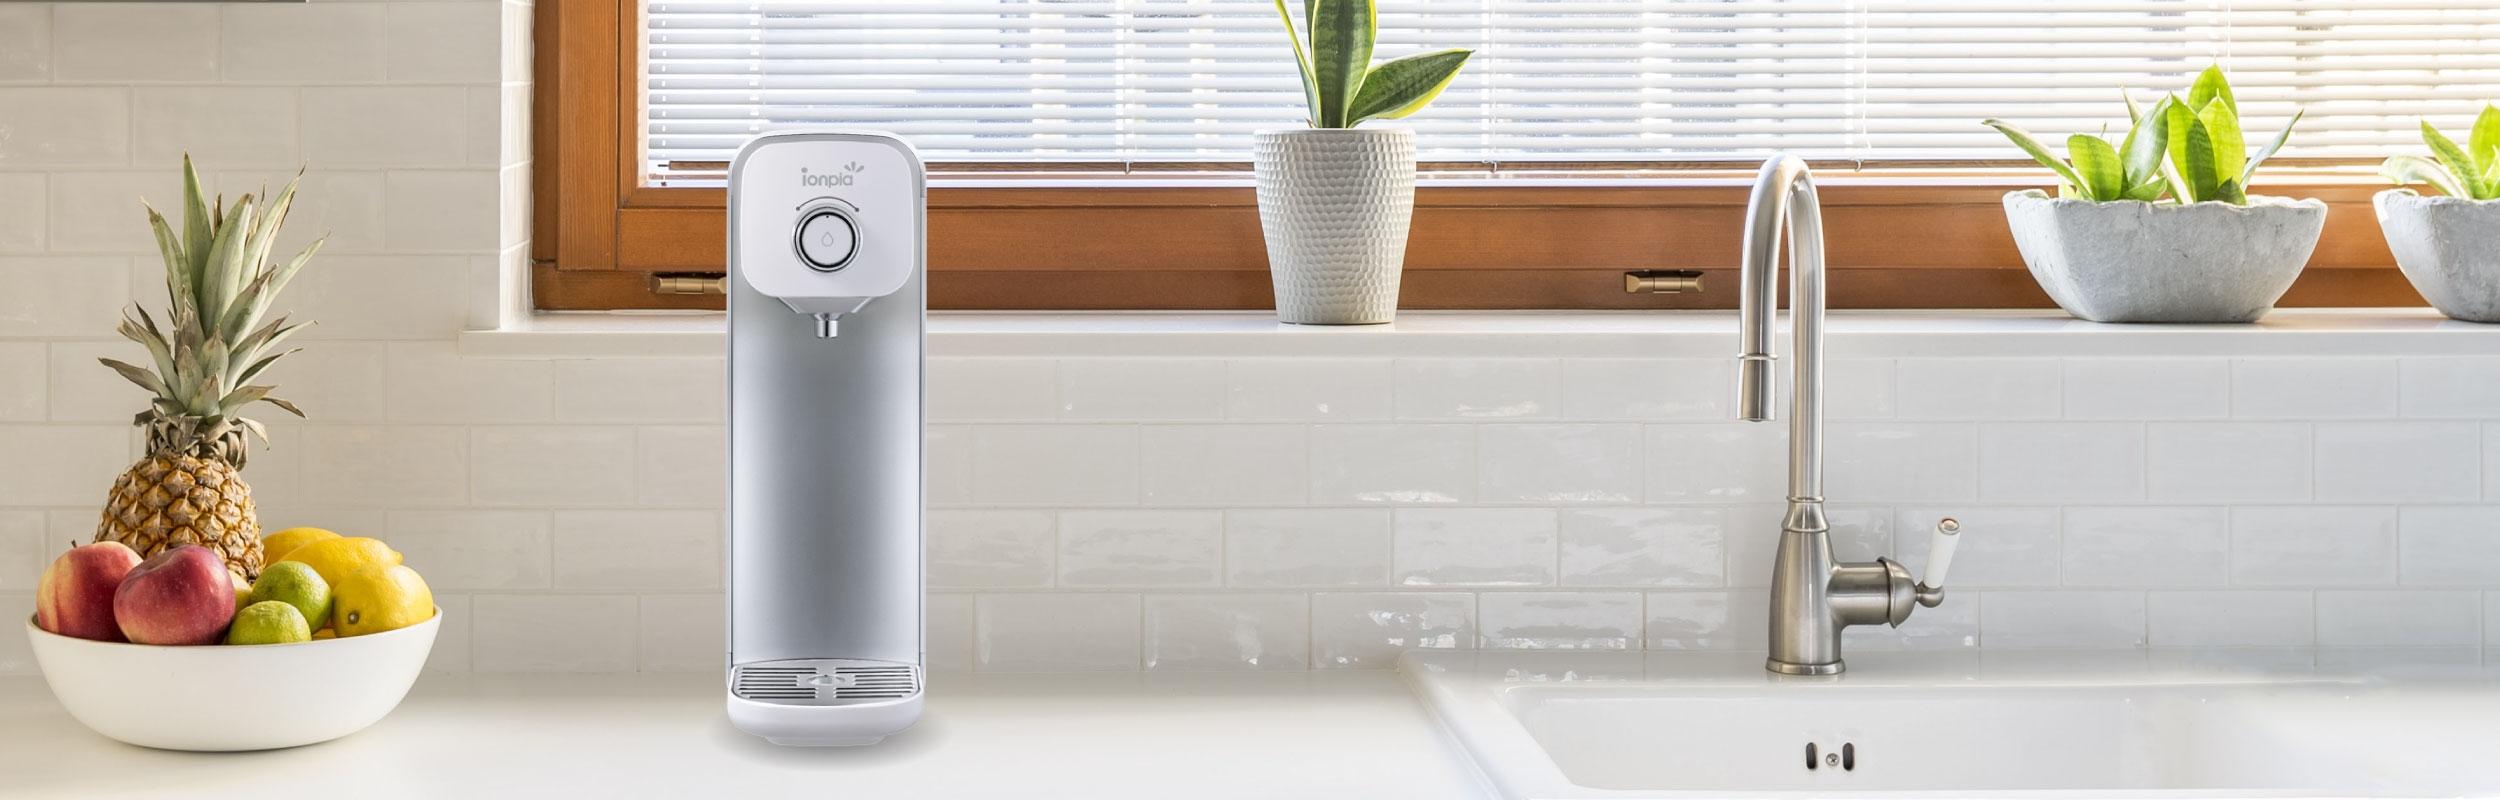 Ionpia kitchen counter top hydrogen-rich water generator